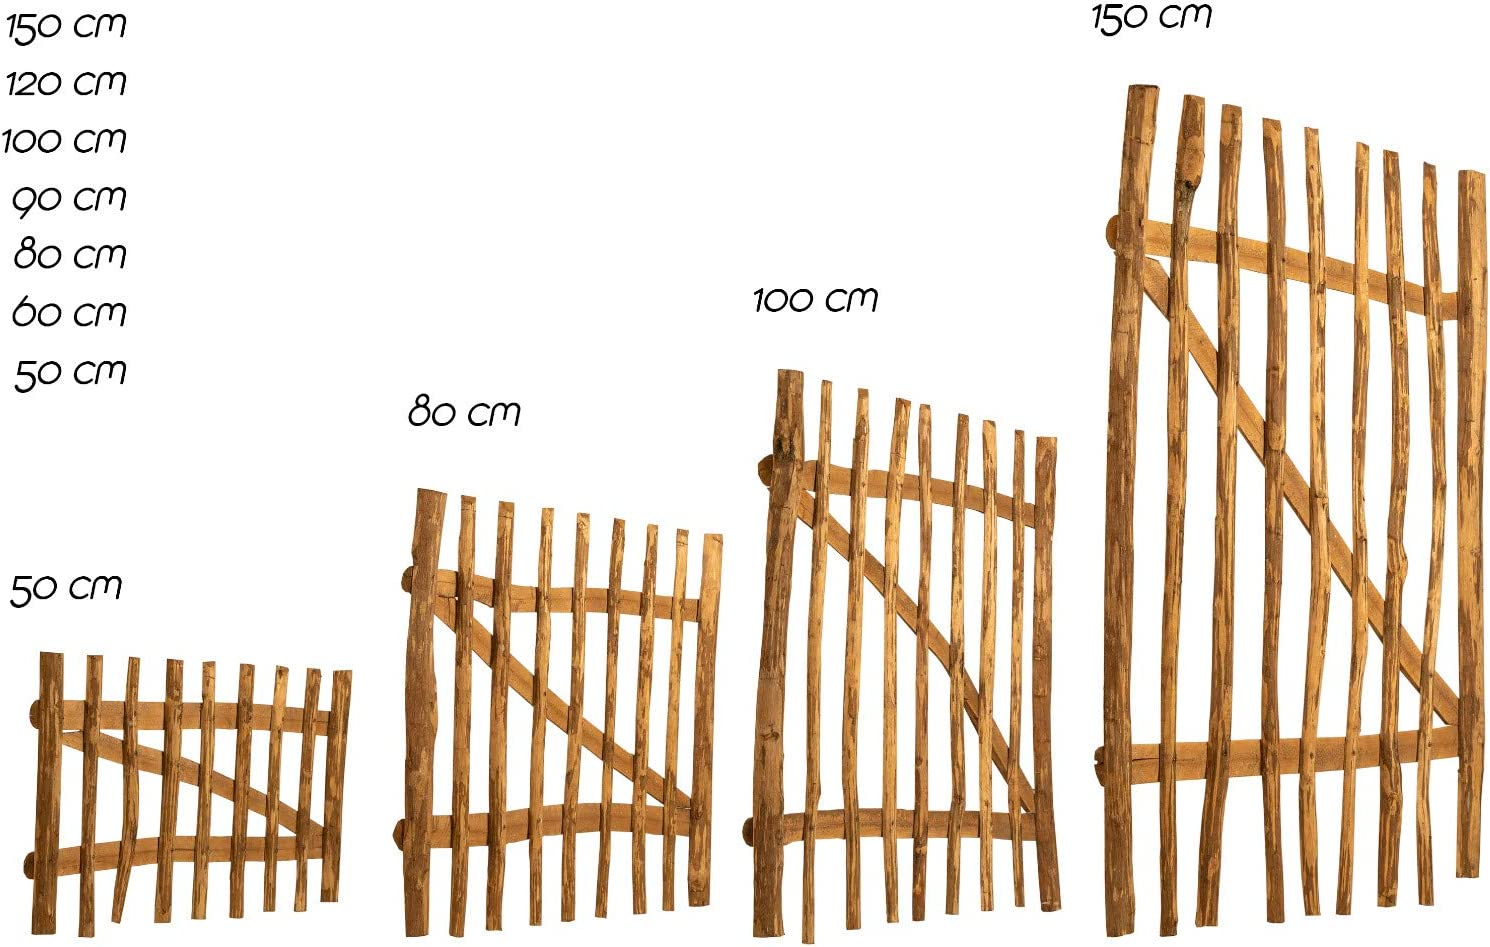 BooGardi Garden Gate Hazelnut Waterproofed /· Wooden Fence Gate for Staket Fence /· Wing Gate in 14 Sizes /· Fence Gate for Staket Fence Chestnut Fence with Accessories Farm Fence